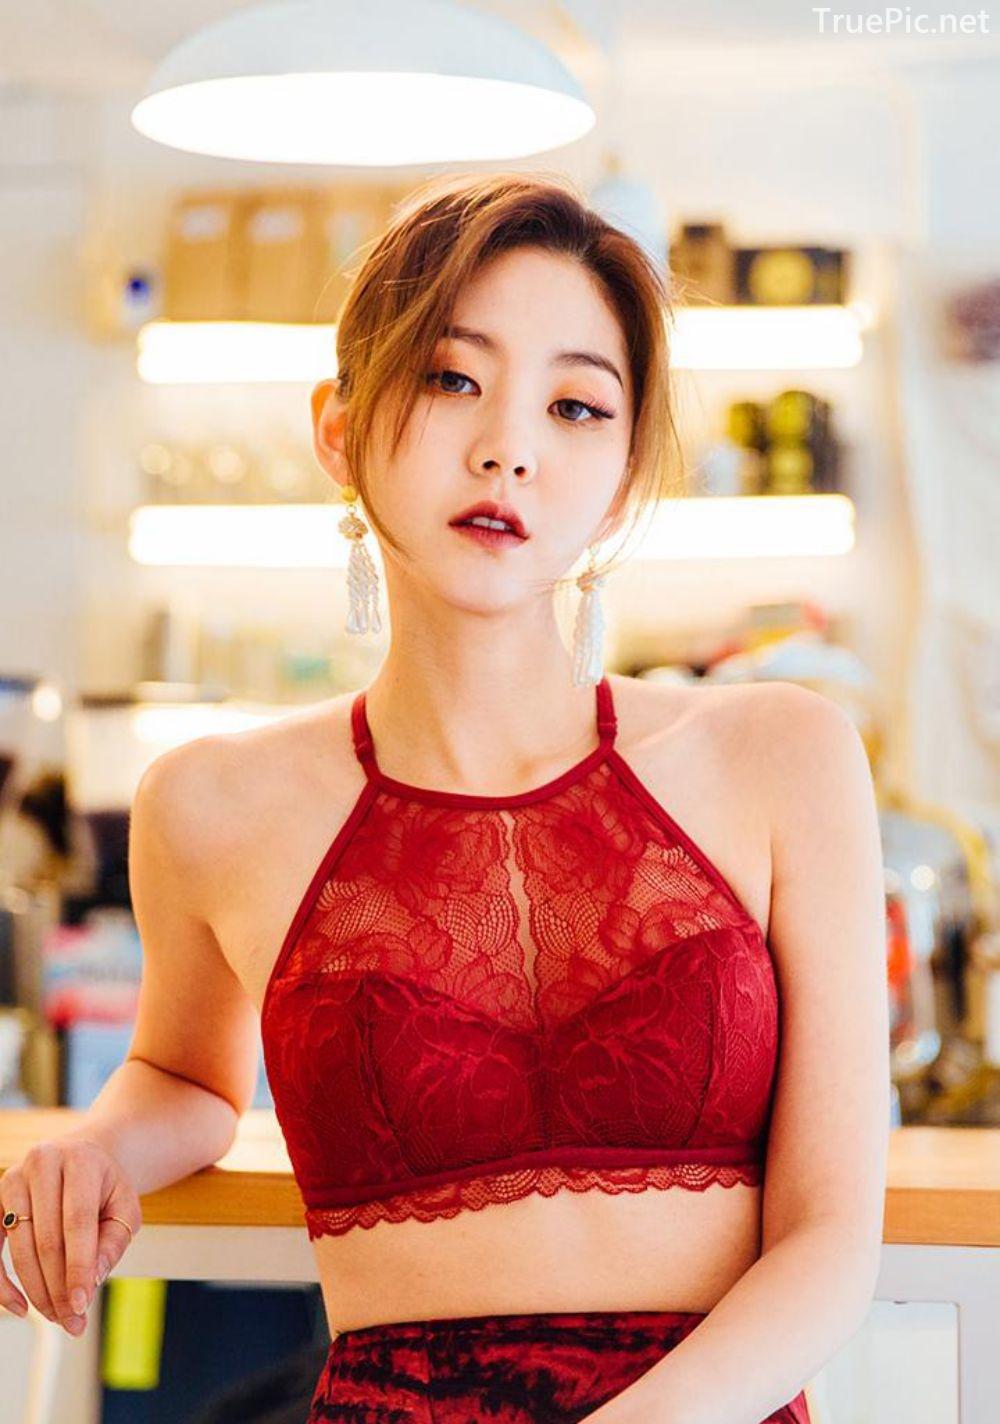 Korean Lingerie Queen - Lee Chae Eun - Red and Black Rabbit Lingerie - TruePic.net - Picture 1